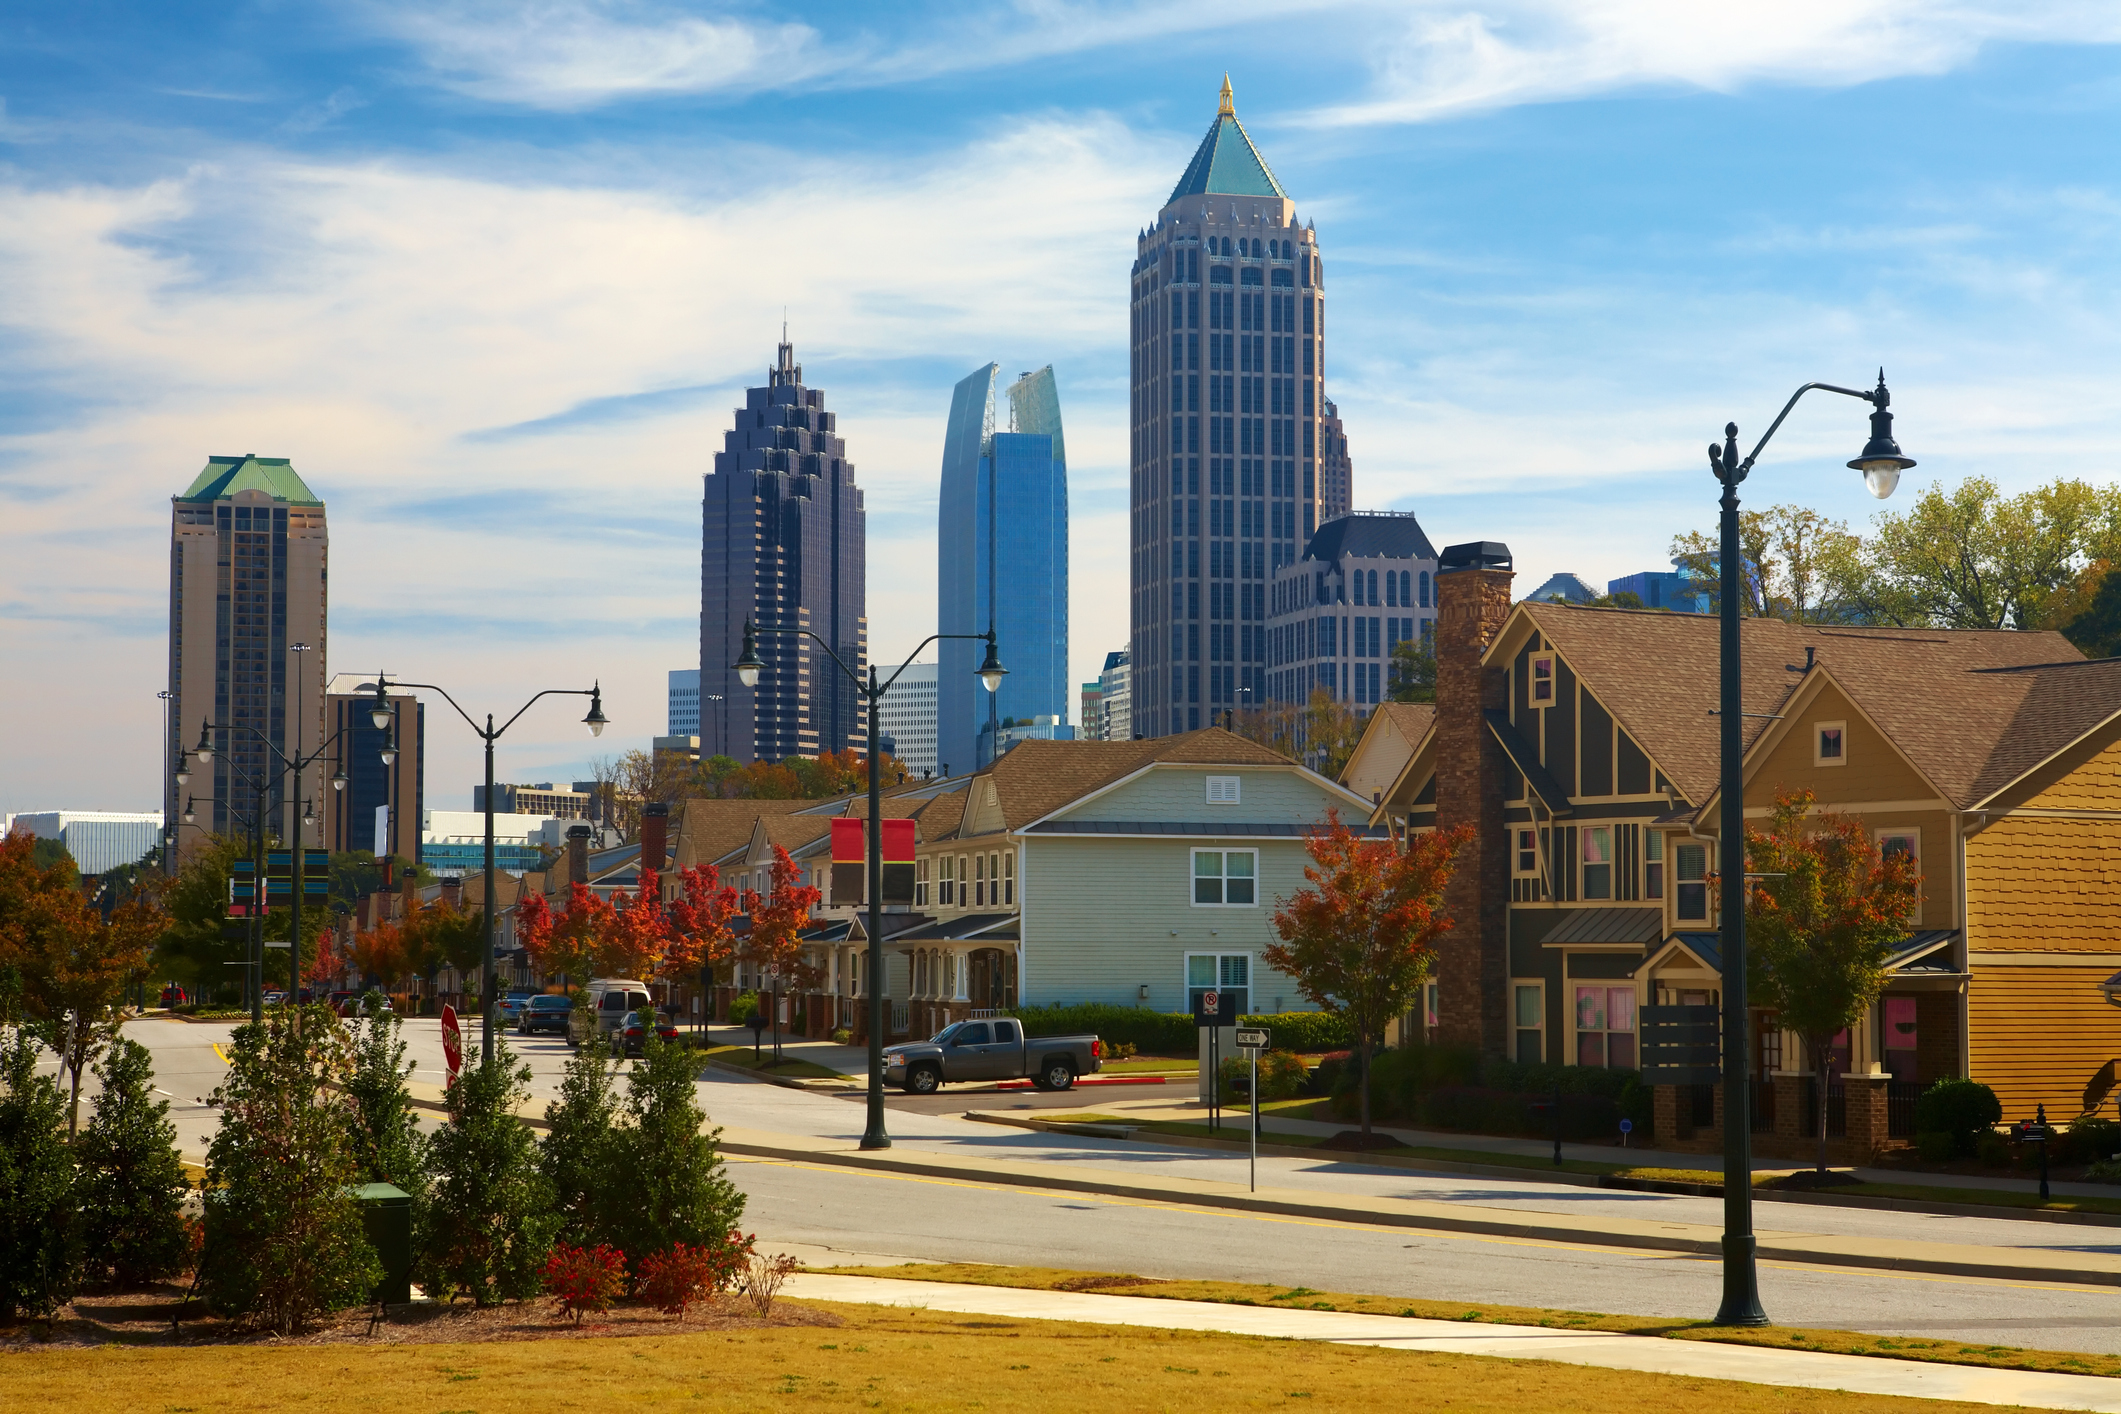 Houses and cars against the midtown. Atlanta, GA. USA.